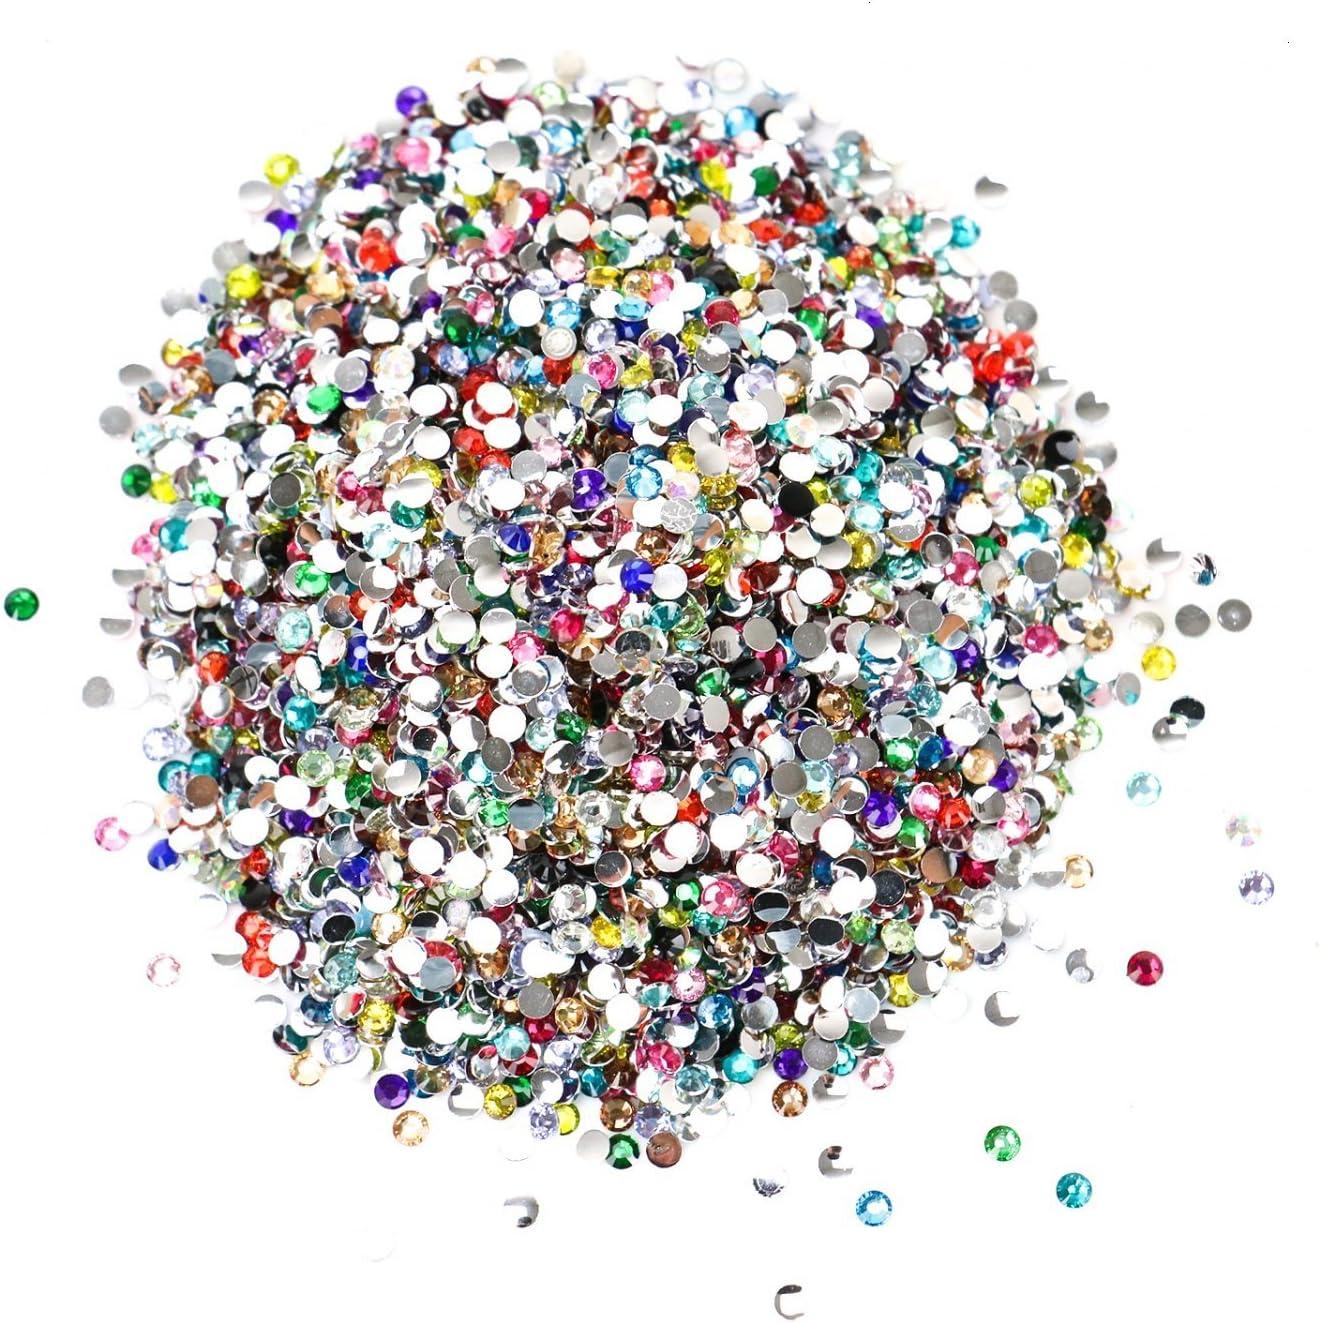 Muticolor Crystal Gems5-12 mm for DIY Craft 9 Shapes Rhinestones /& Jewels Stickers Yesland 1800 Pcs Gems Acrylic Flatback Rhinestones Gemstone Embellishments